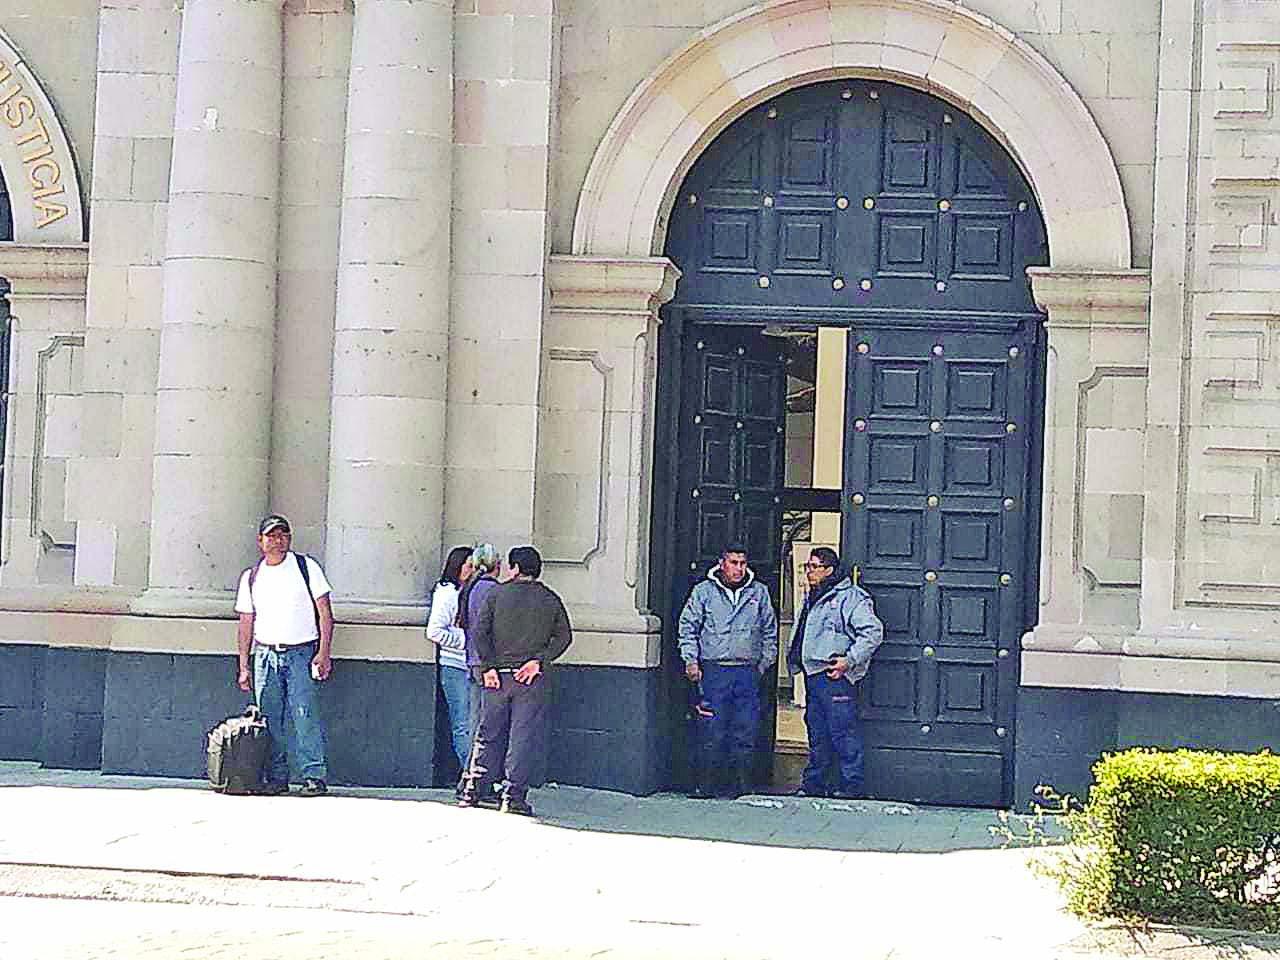 Toluca, presos, brazaletes, piden cambio, cárcel